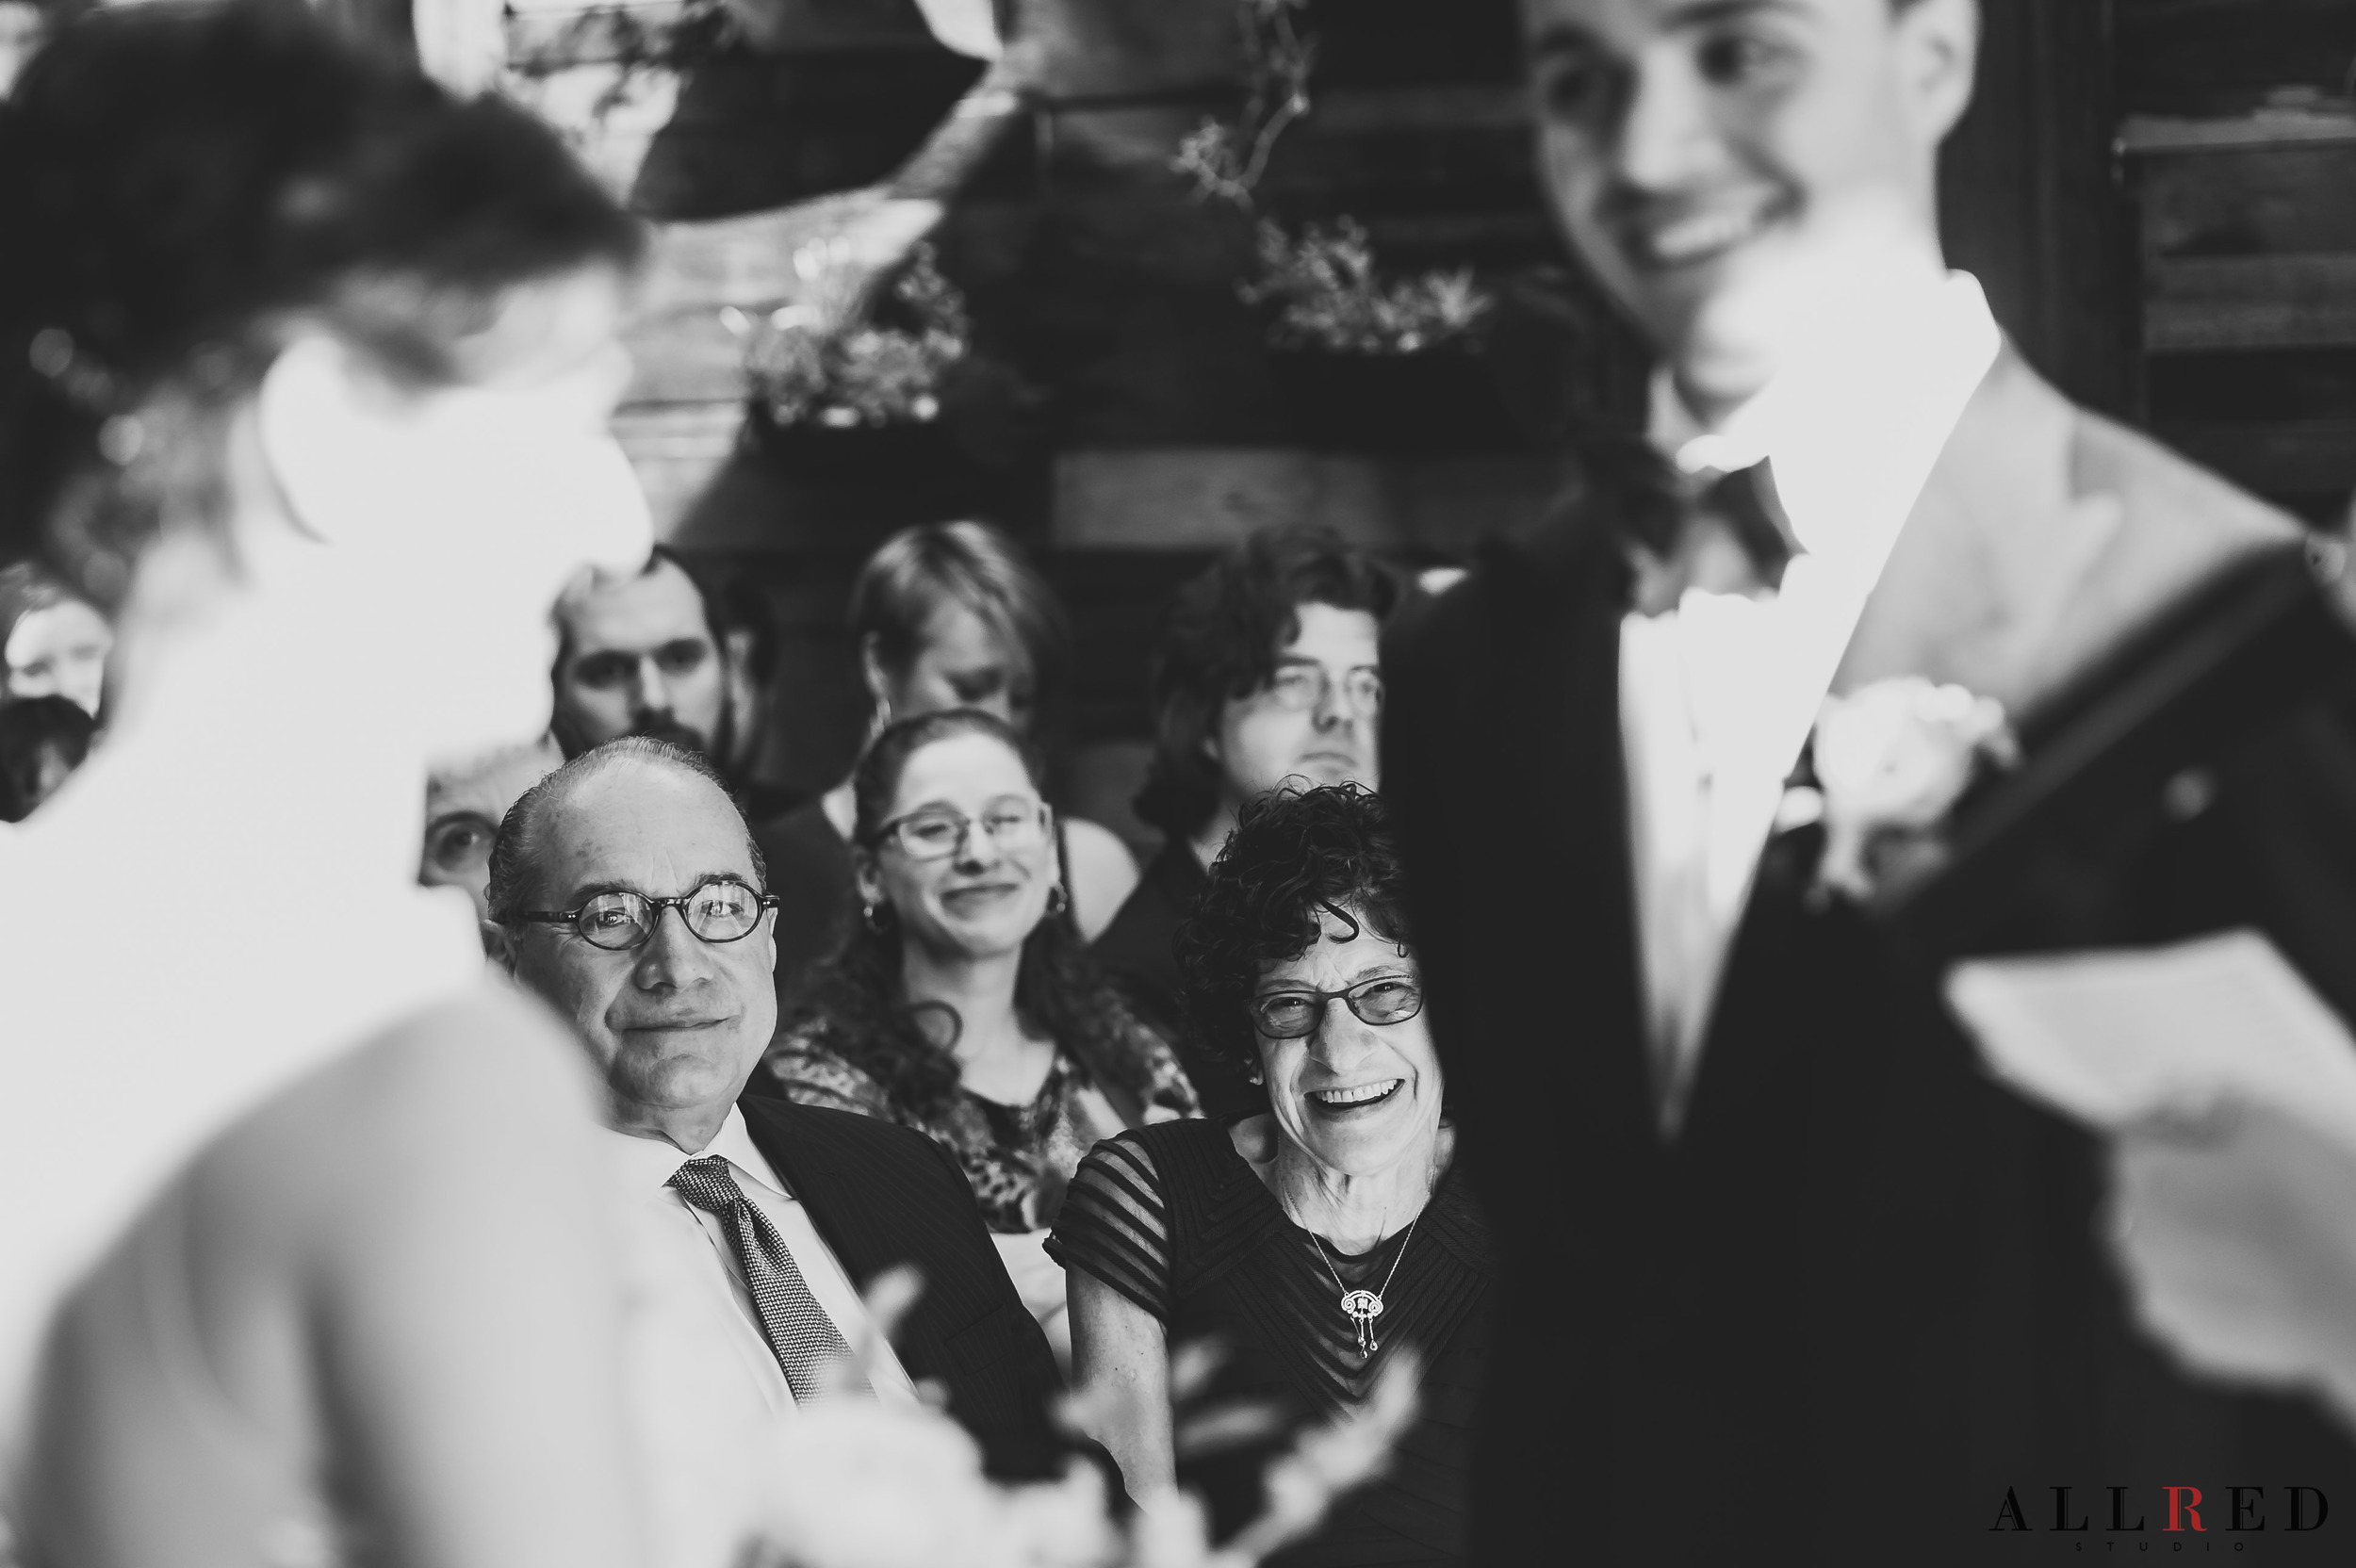 Wedding-Brooklyn-winery-allred-studio-new-york-photographer-new-jersey-hudson-valley-00796.jpg